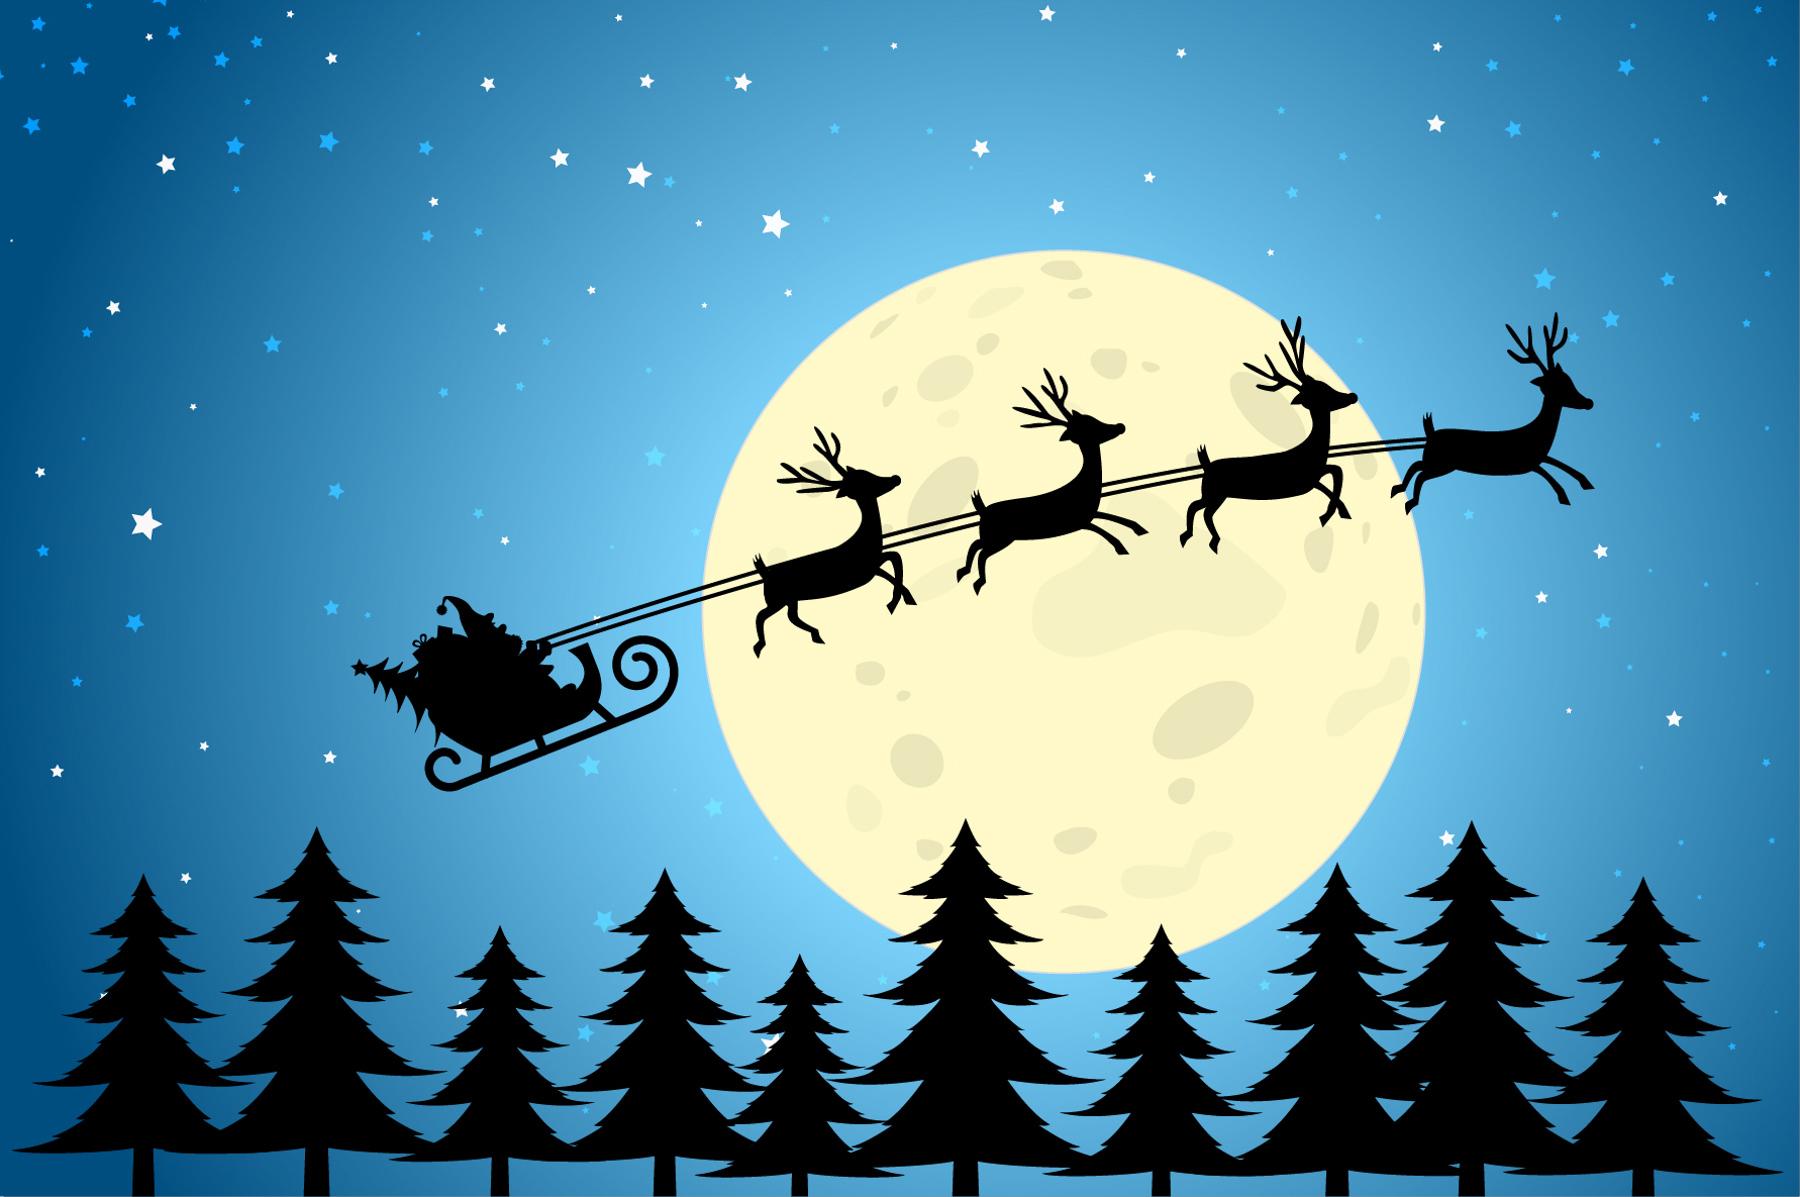 cartoon image of santa riding in sleigh with reindeer in front of moon shutterstock - Santa With Reindeer